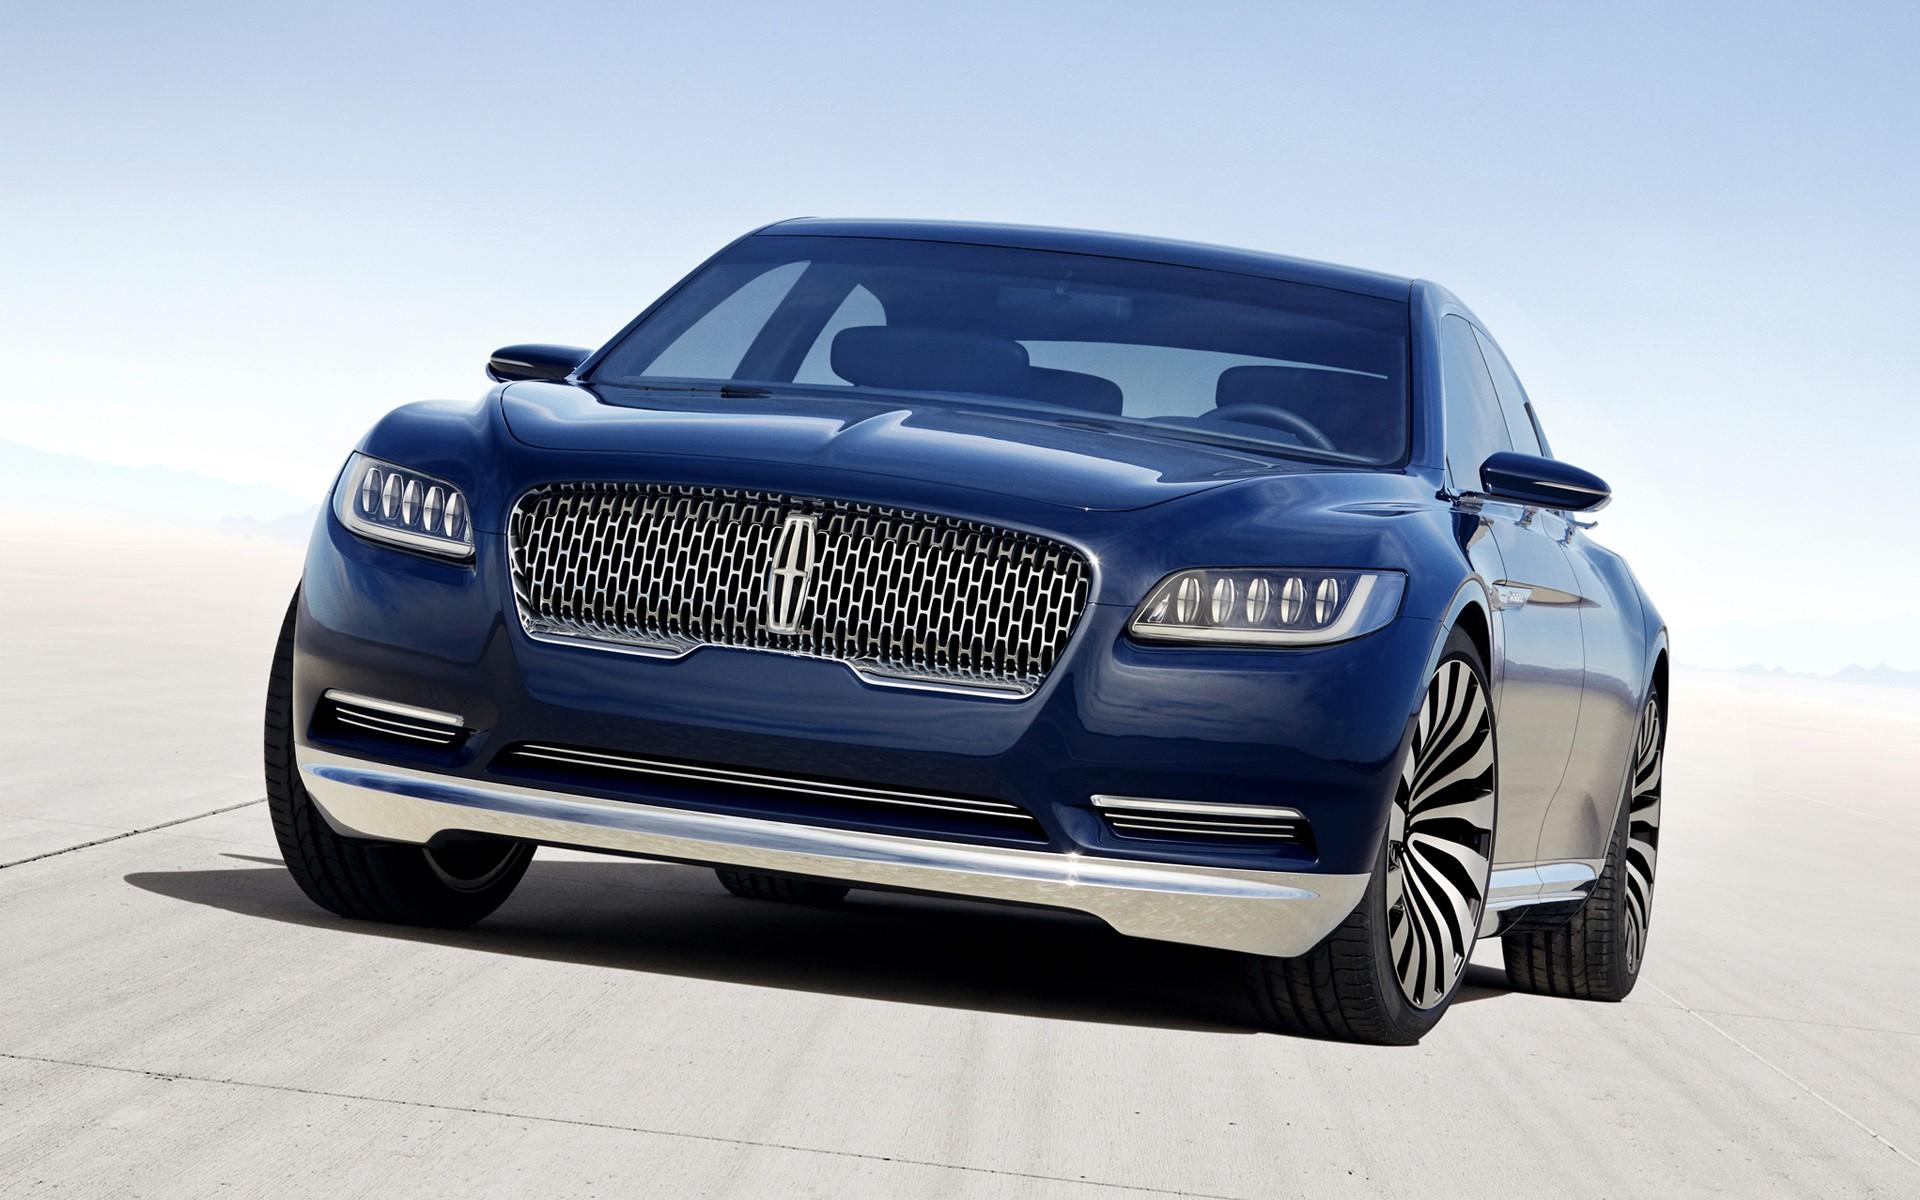 2016 Lincoln Continental Concept Wallpaper Hd Car